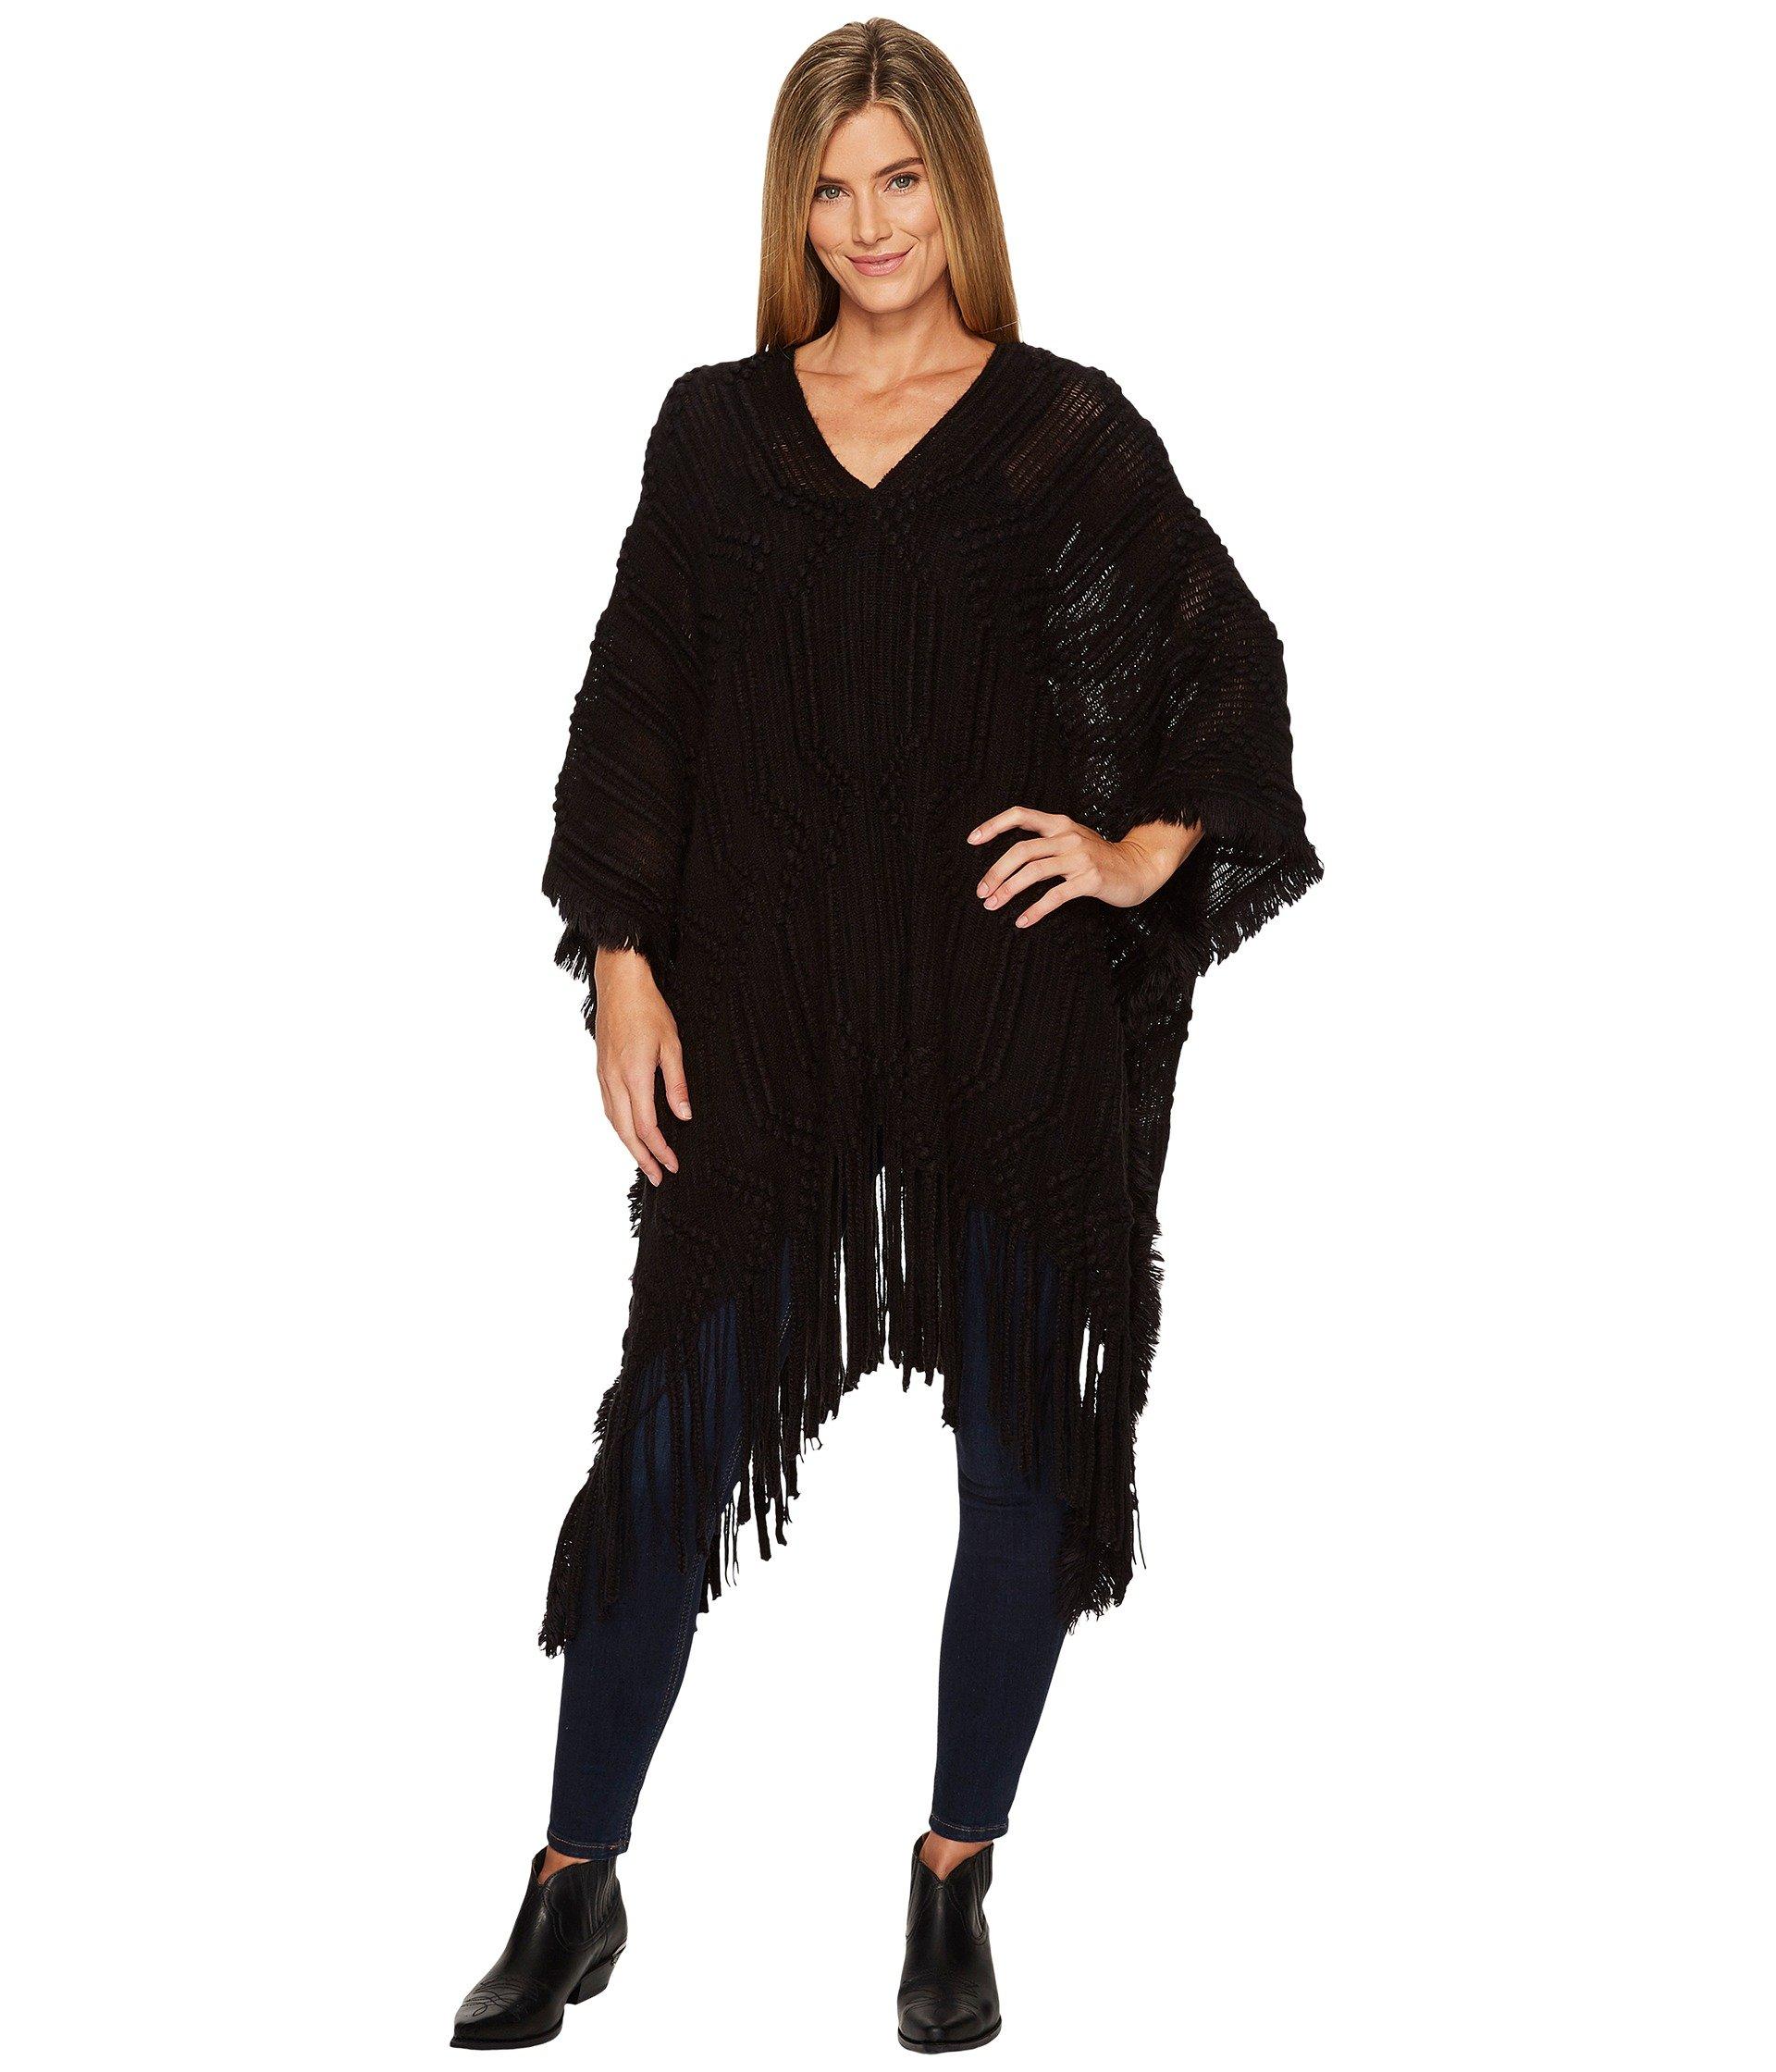 Saco para Mujer Wrangler Textured Sweater Knit Poncho Fringe  + Wrangler en VeoyCompro.net